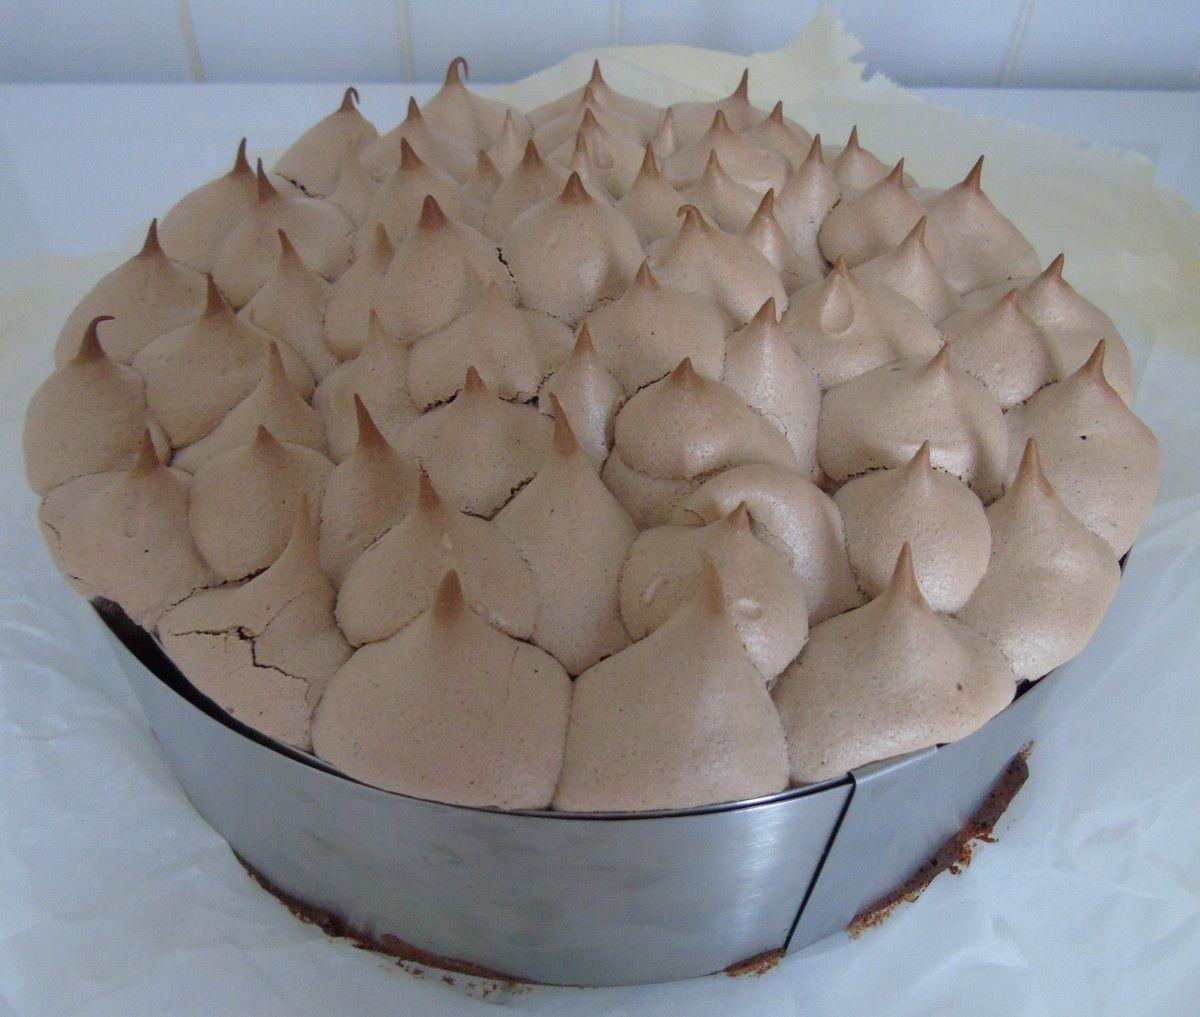 Gâteau de folie au chocolat meringué